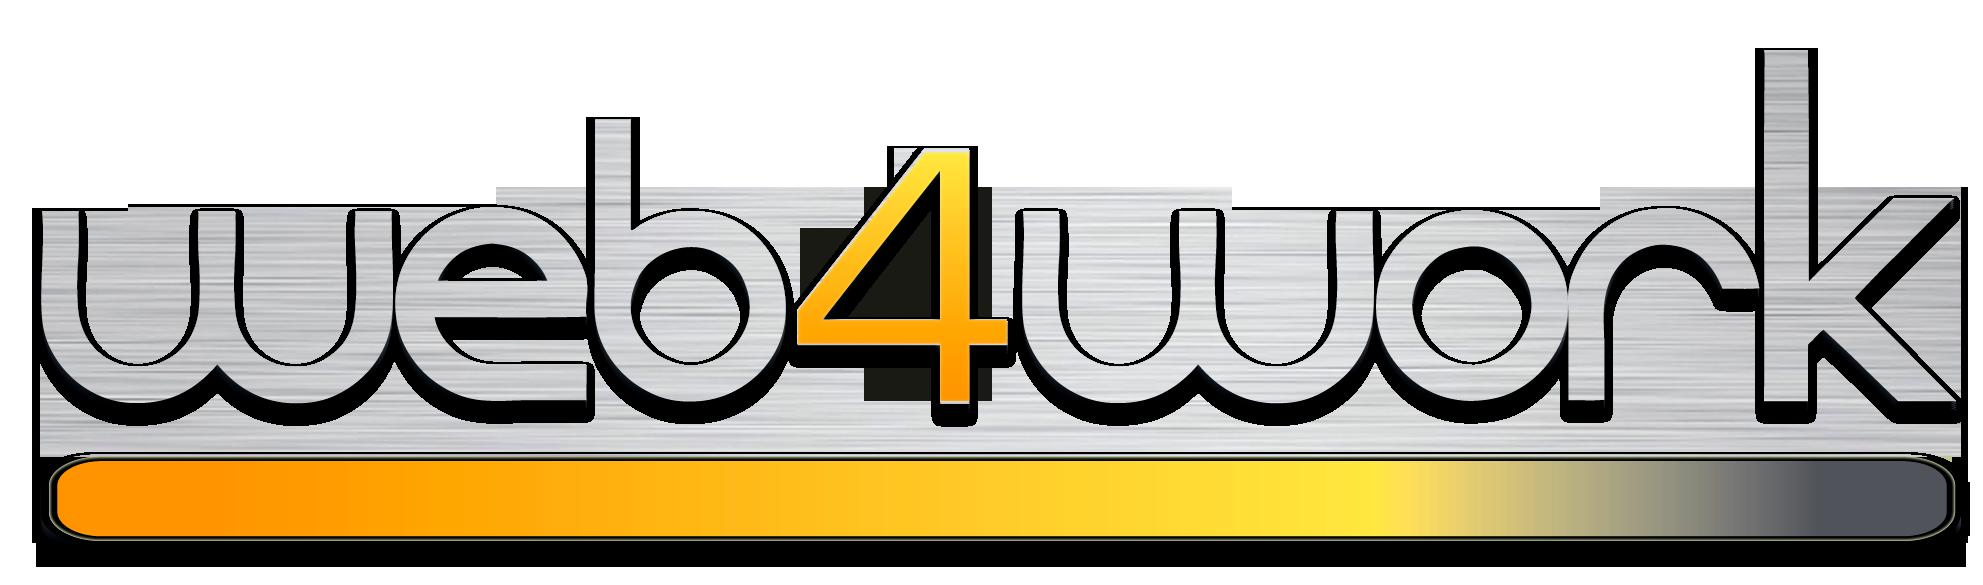 web4work